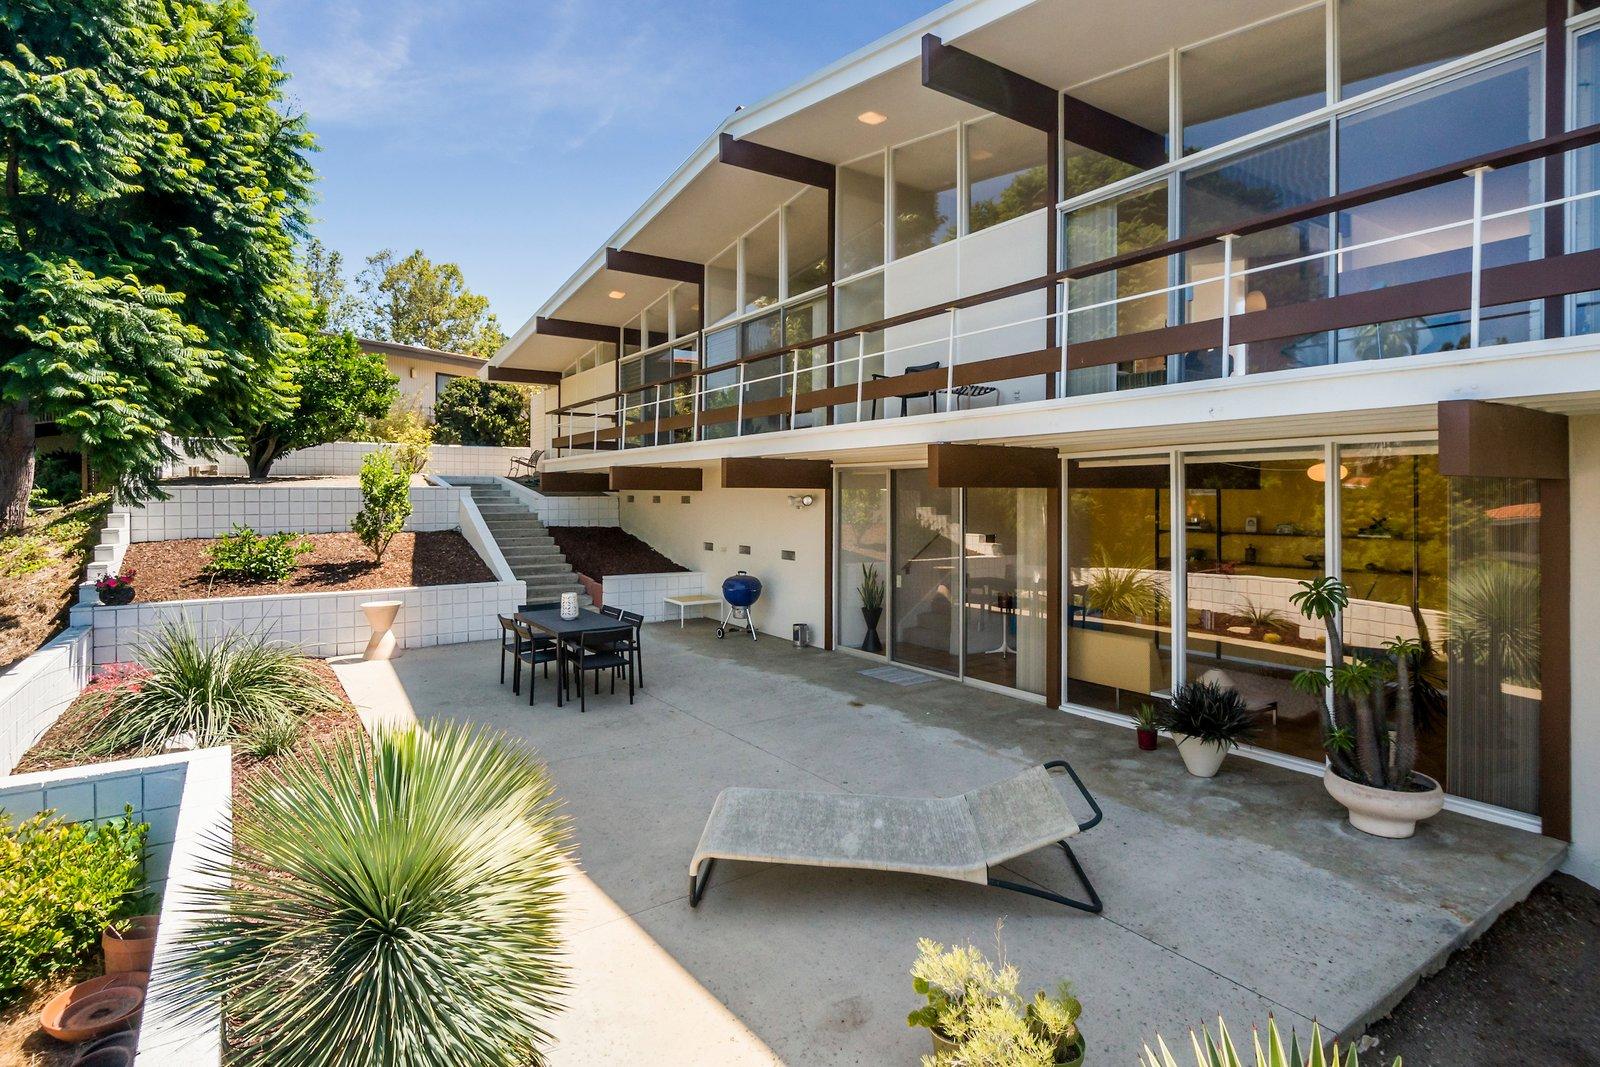 DeLeeuw Residence backyard with concrete patio.